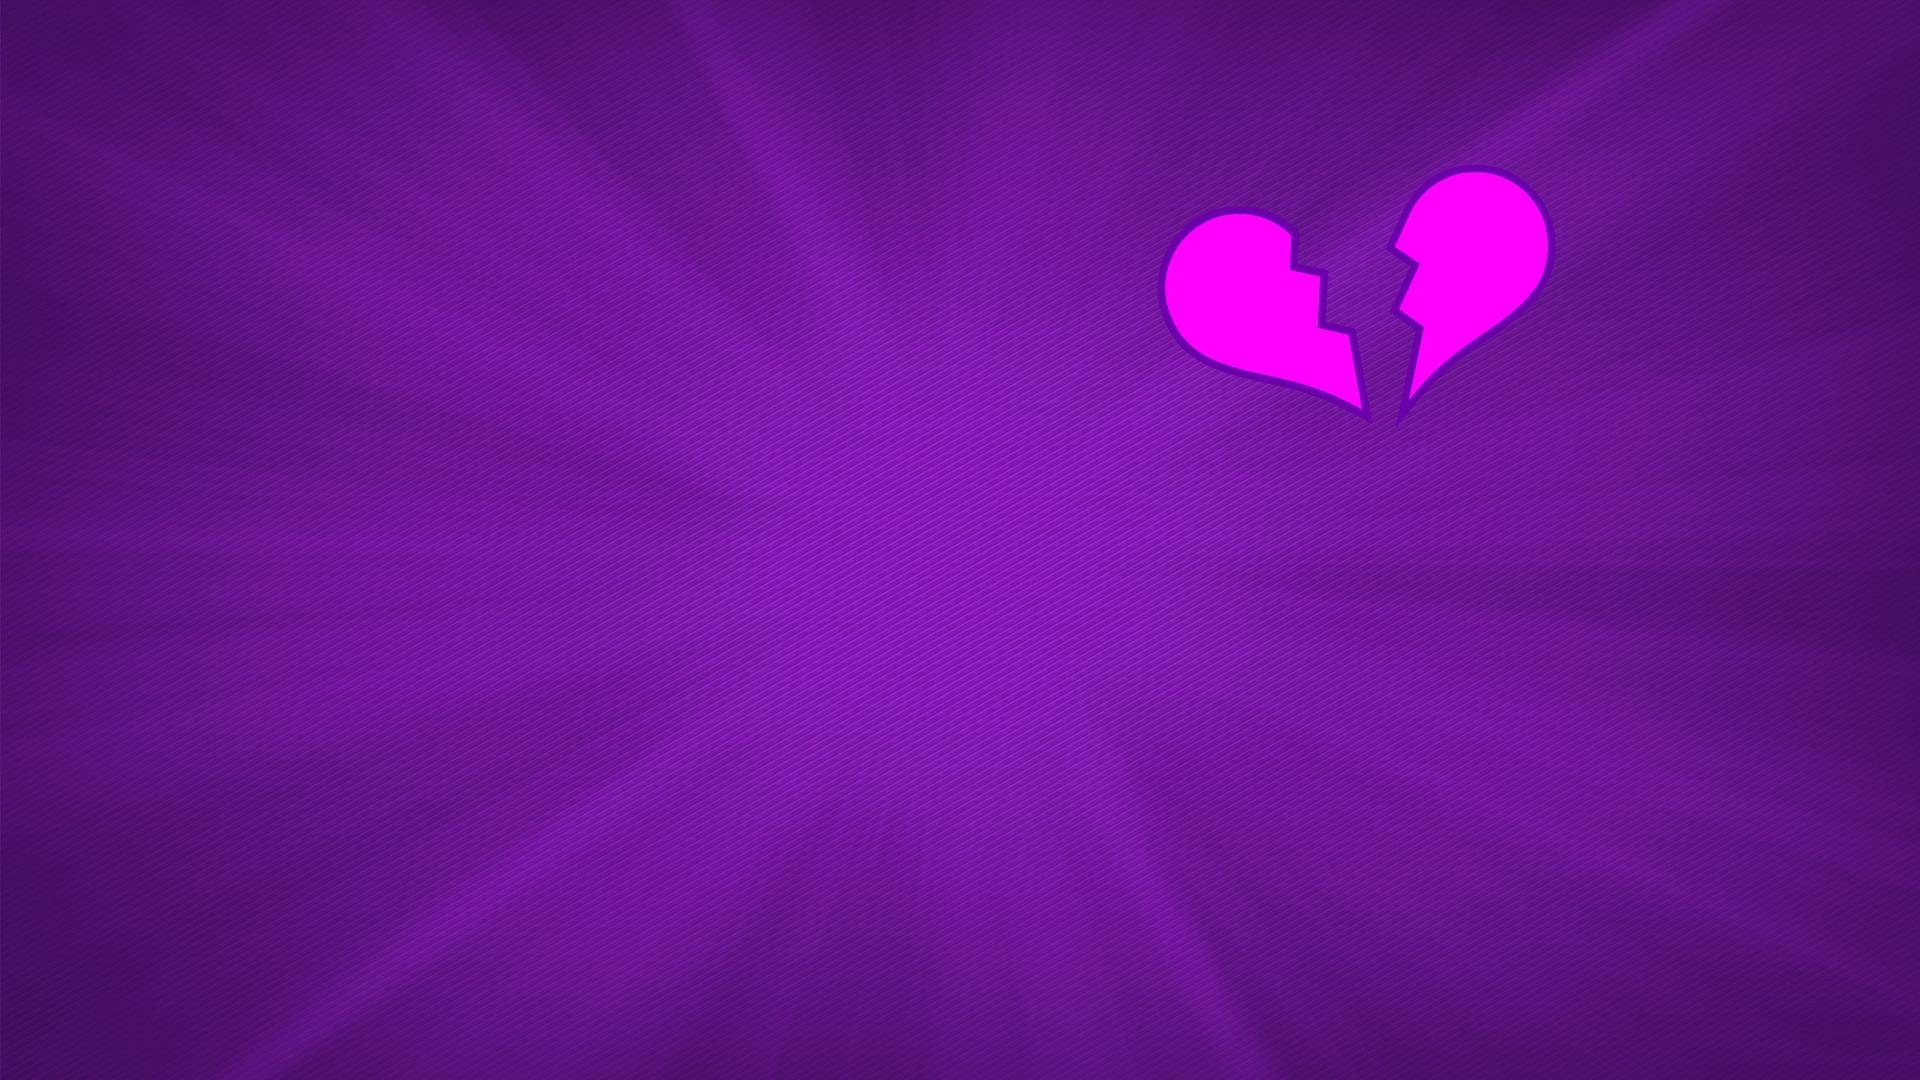 Broken Heart Quotes Wallpapers Free Download Free Download Broken Heart Background Pixelstalk Net